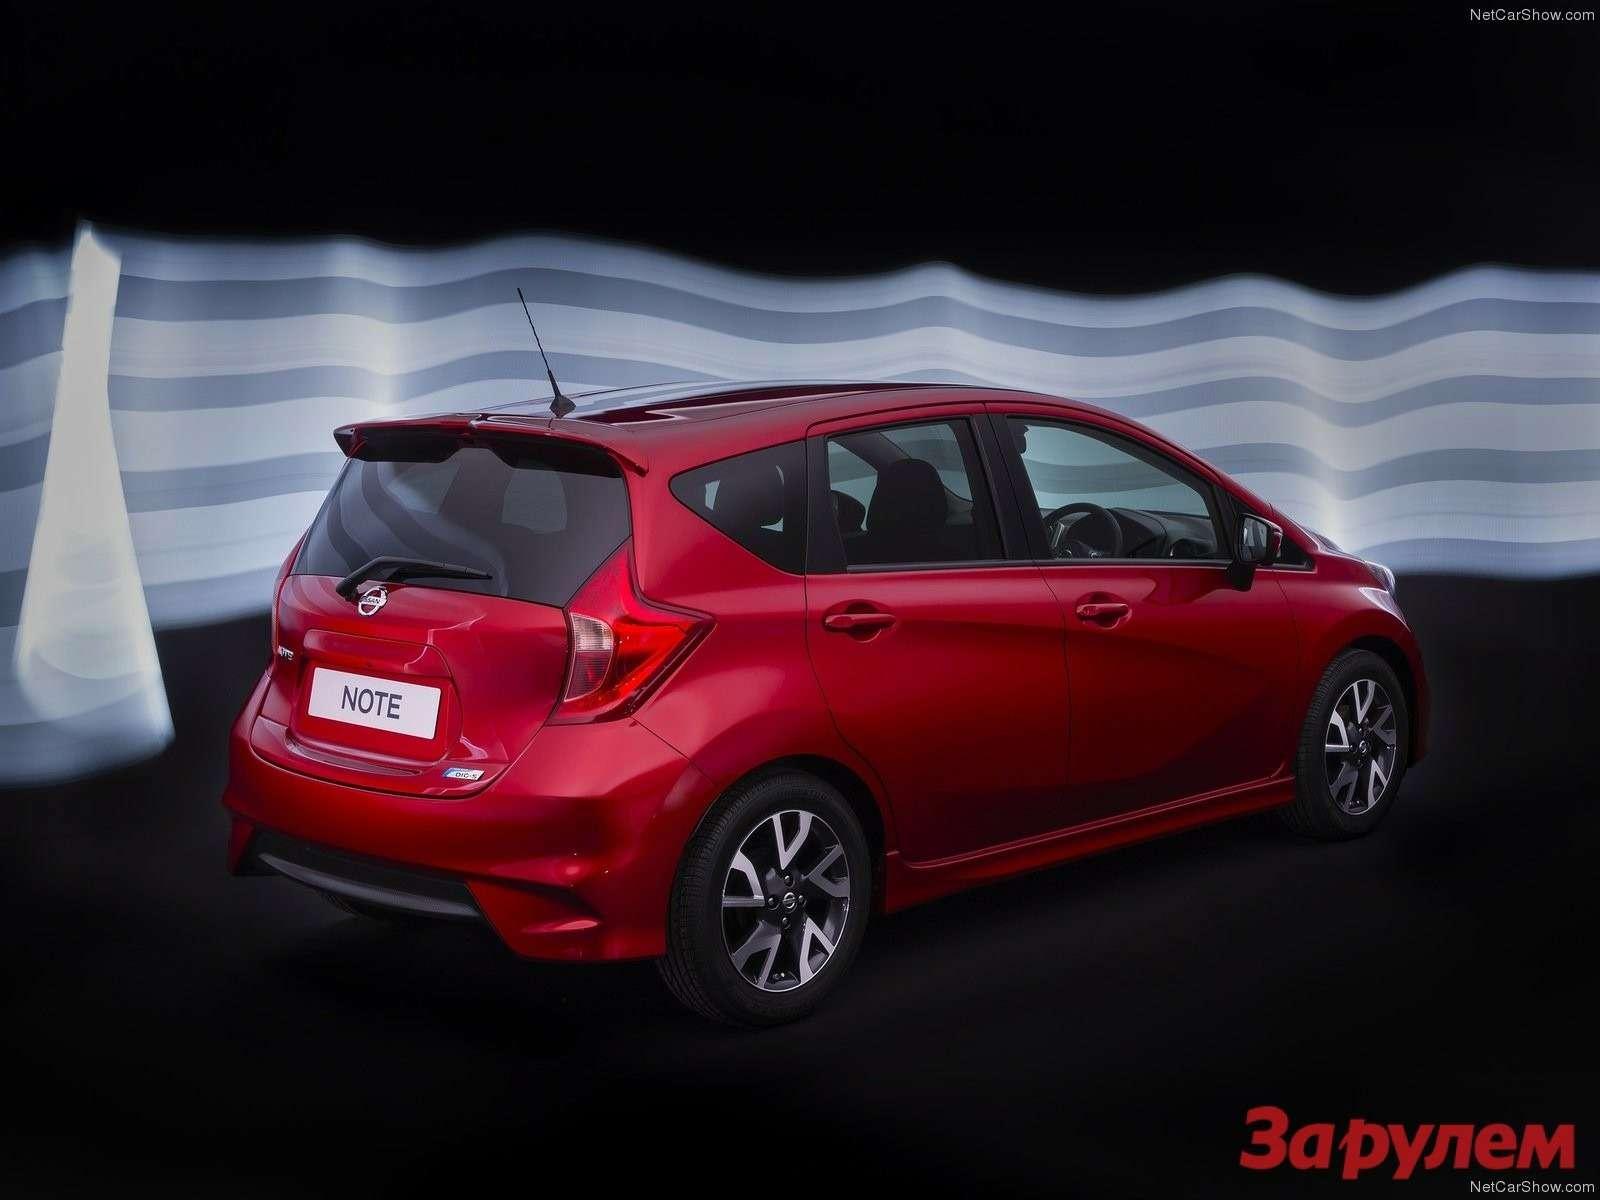 Nissan-Note_2014_1600x1200_wallpaper_06